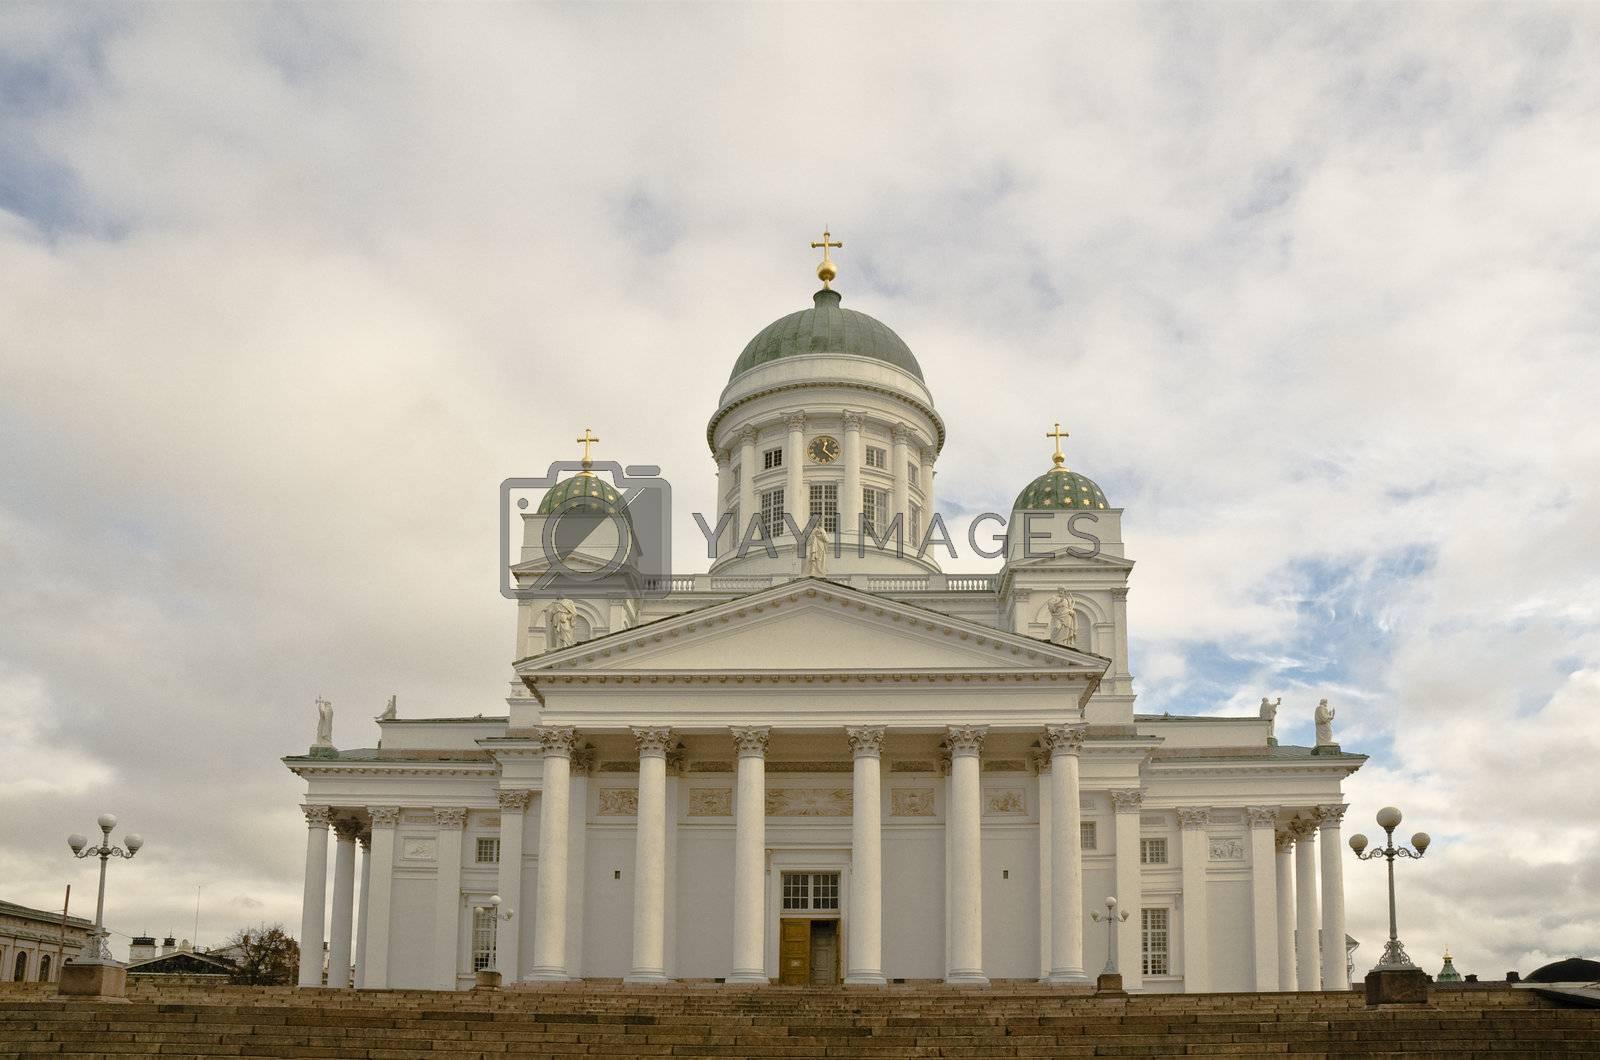 Lutheran Cathedral on the Senatorial area. Helsinki.